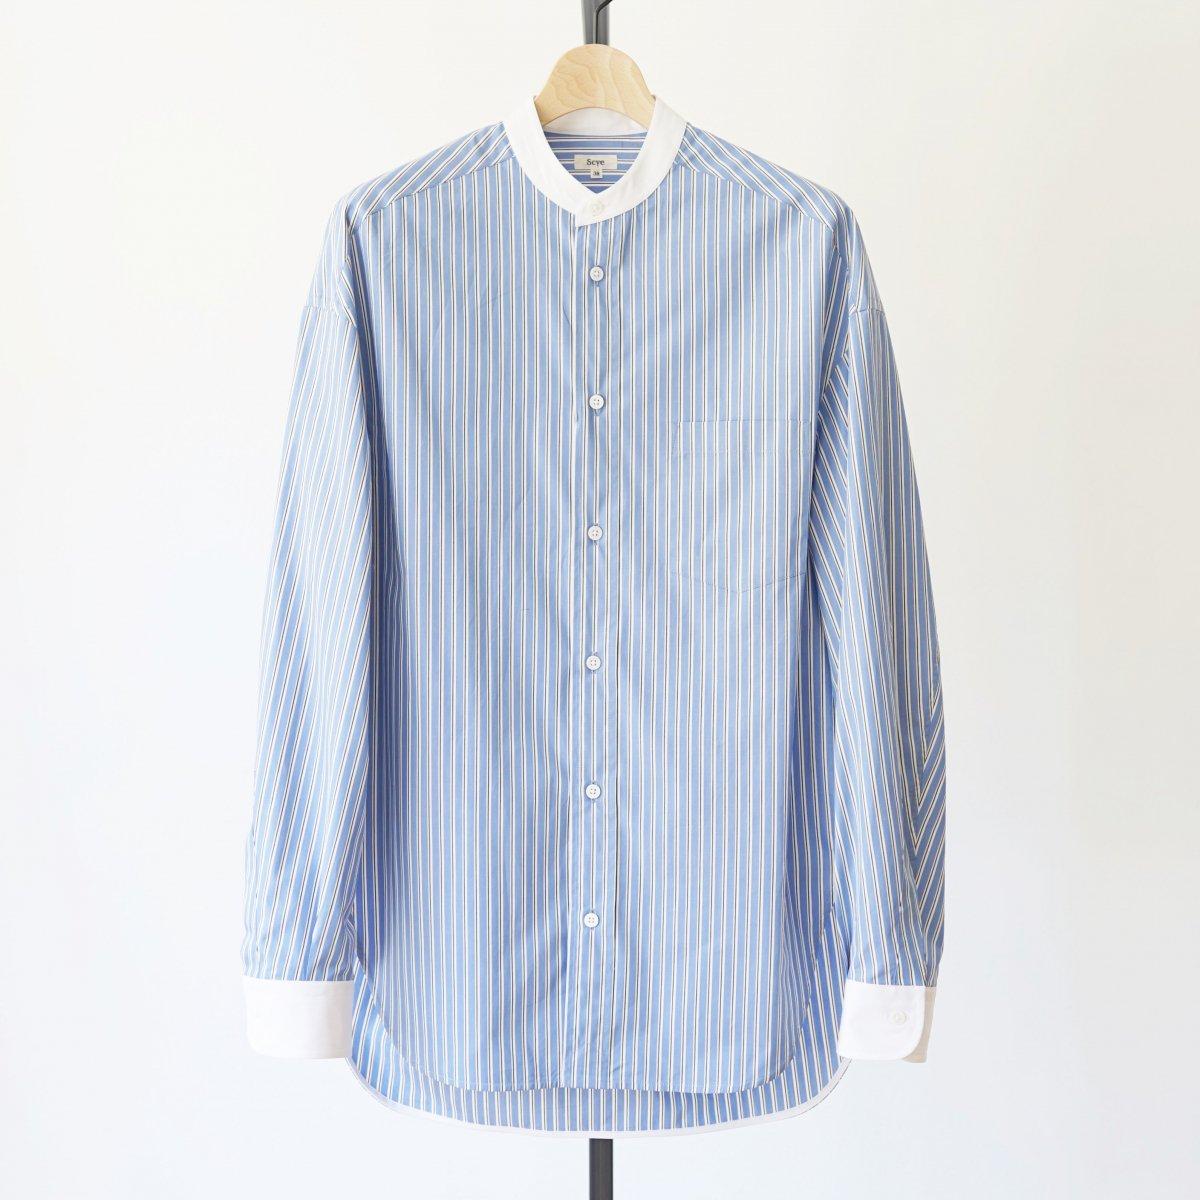 【Scye】STRIPED COTTON POPLIN BIG SHIRT - SAX BLUE